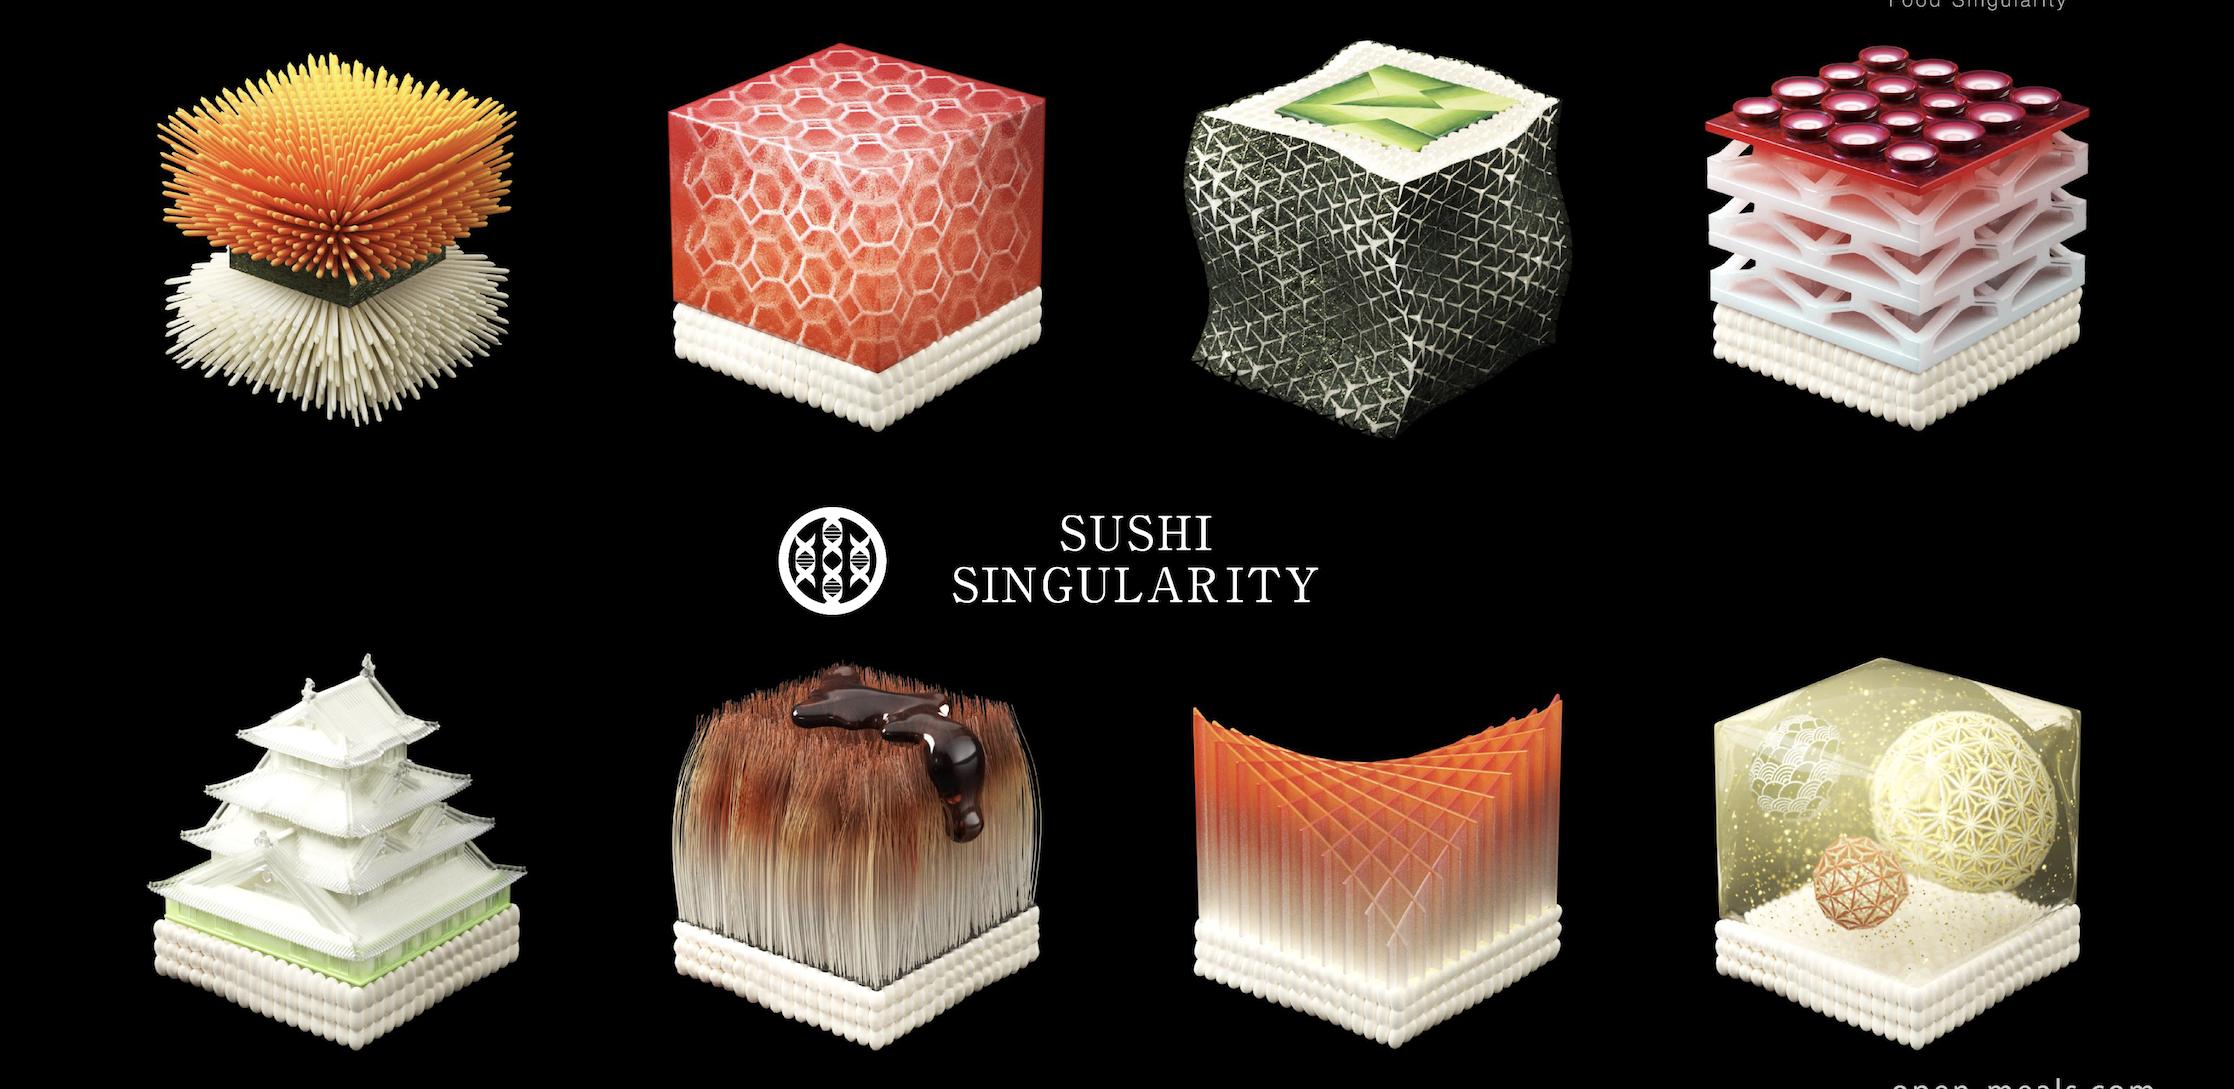 3D printed sushi, Sushi Singularity